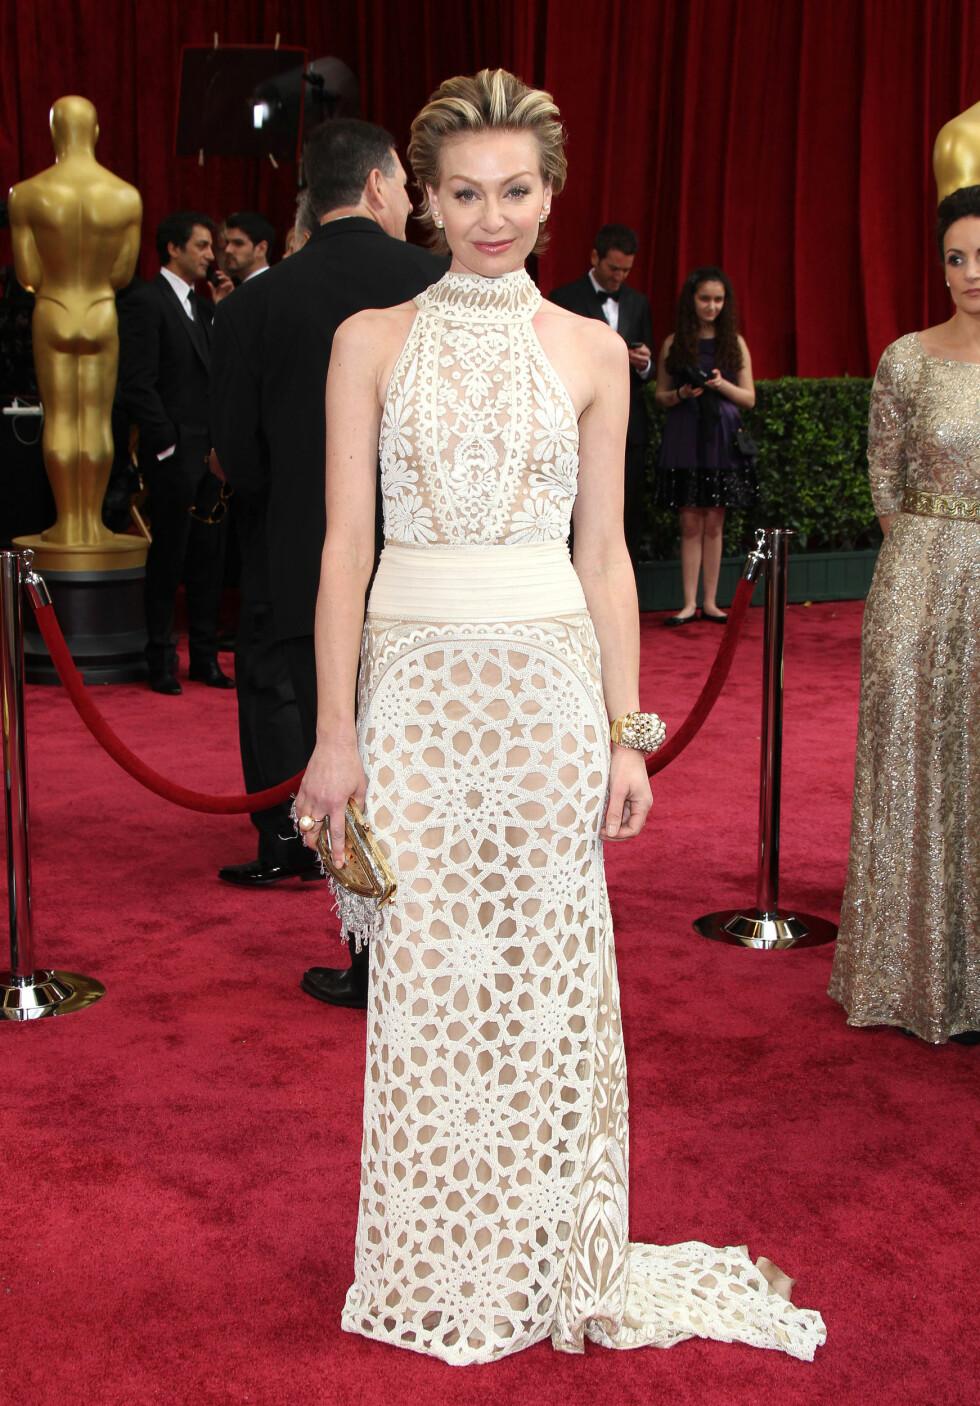 Portia de Rossi i kjole fra Naeem Khan. Foto: All Over Press